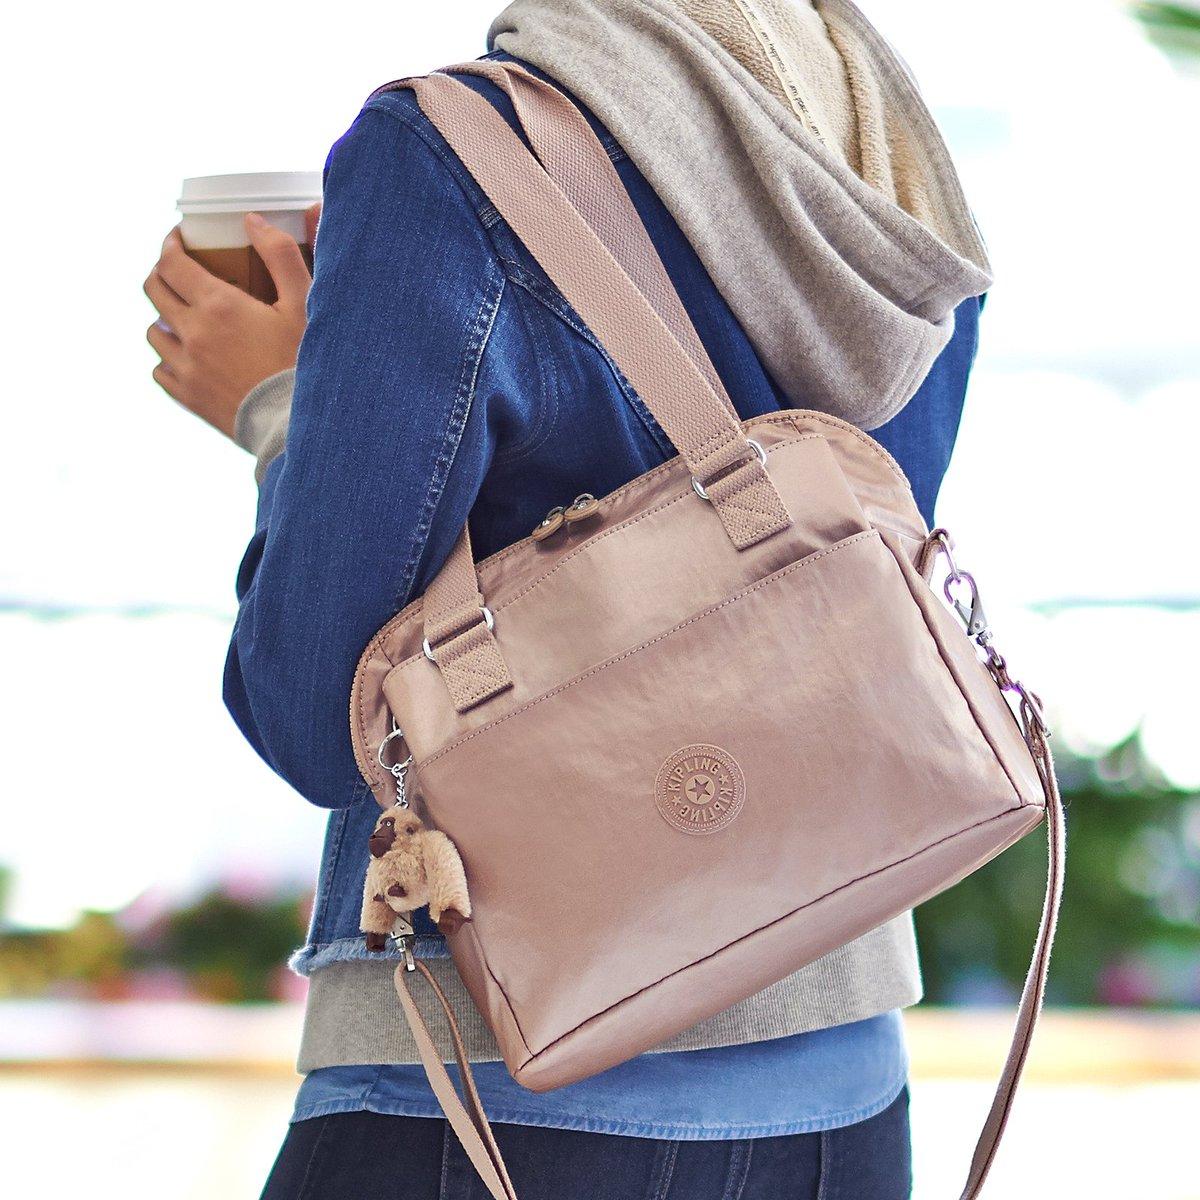 Kipling Bags Qvc Presenter